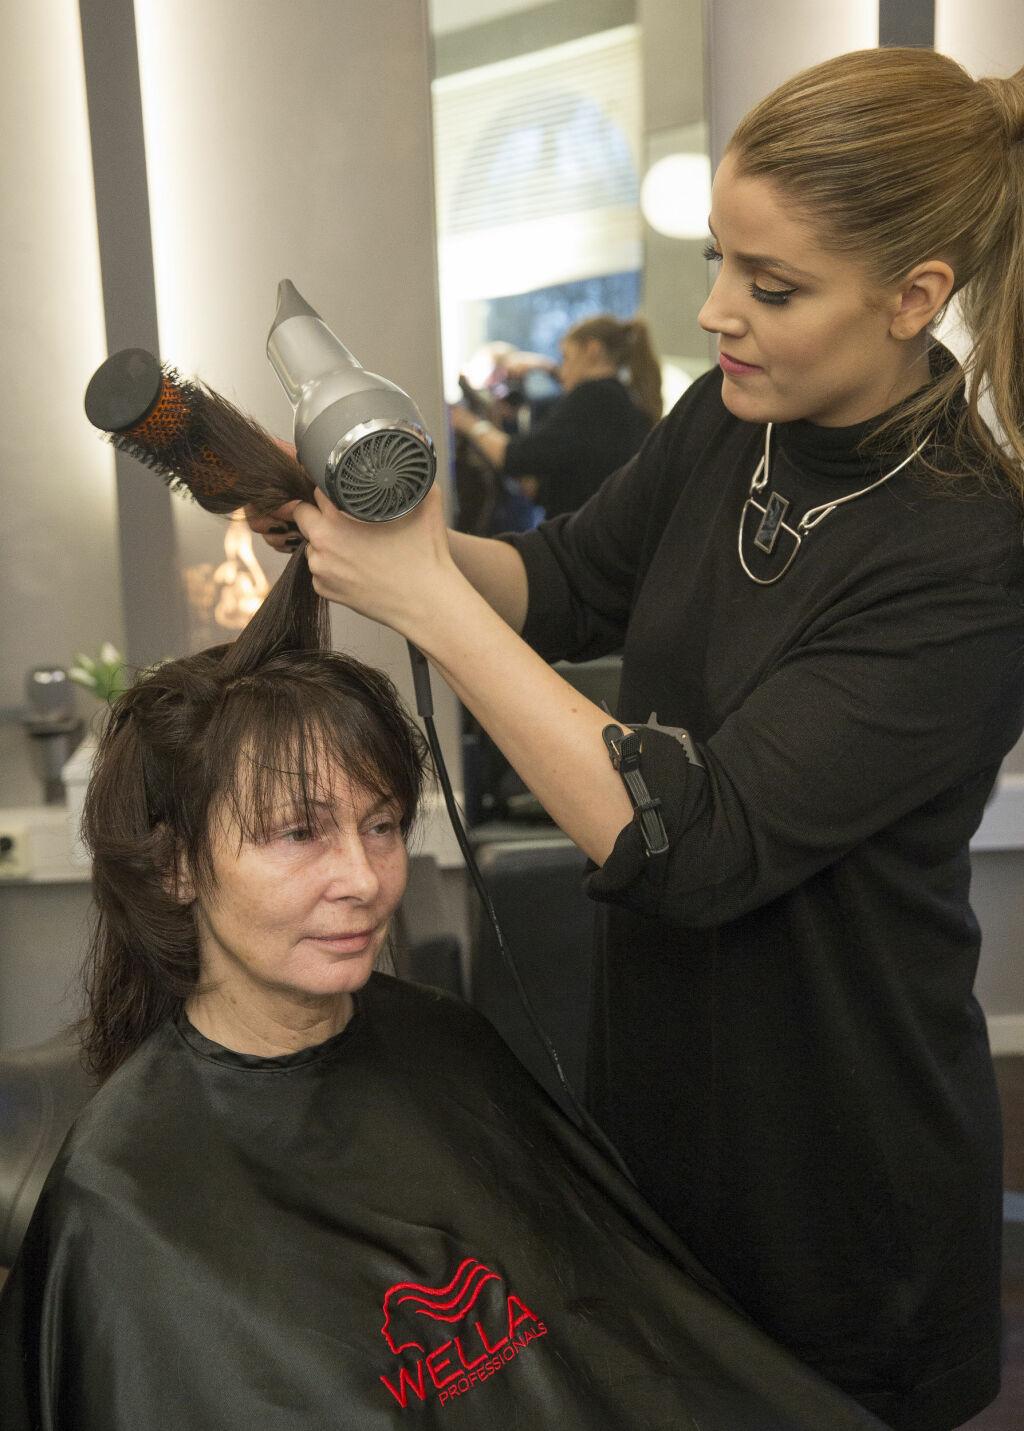 EKSPERTHJELP: Frisør og stylist Cecilie Krogh Sundbø på Jan Thomas Studio farget og klippet Berets lokker.